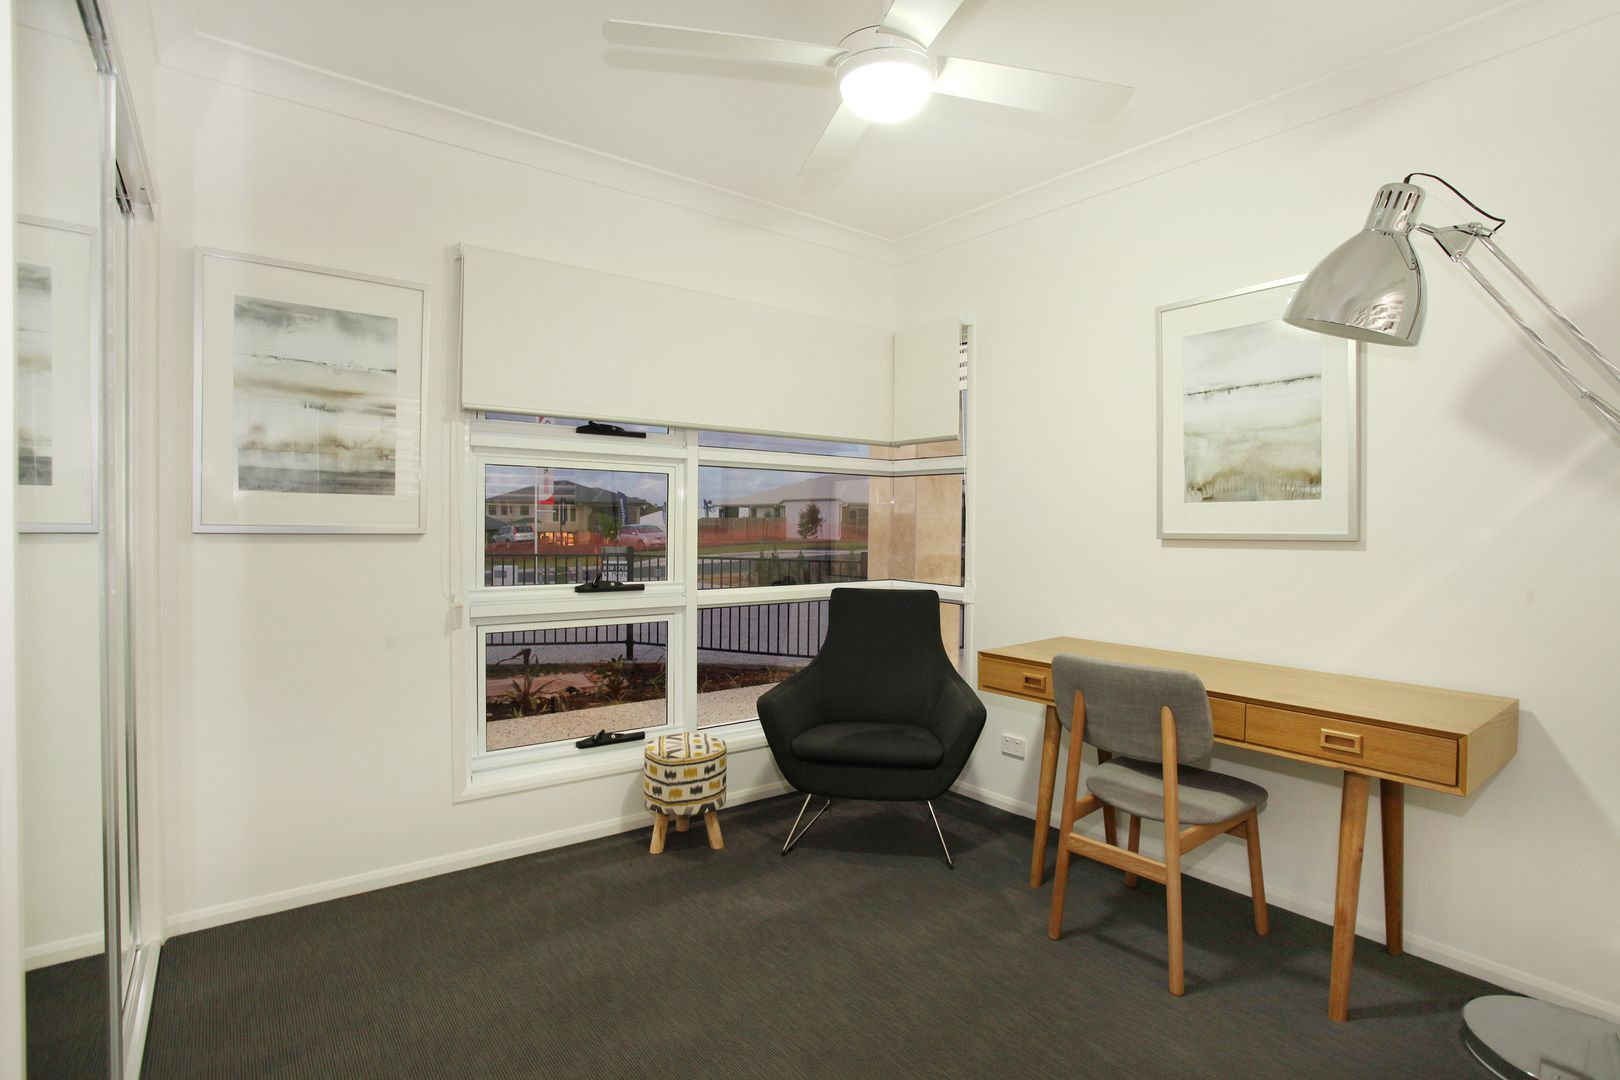 Lot 14 Gilmour Terrace, Kalbar QLD 4309, Image 2